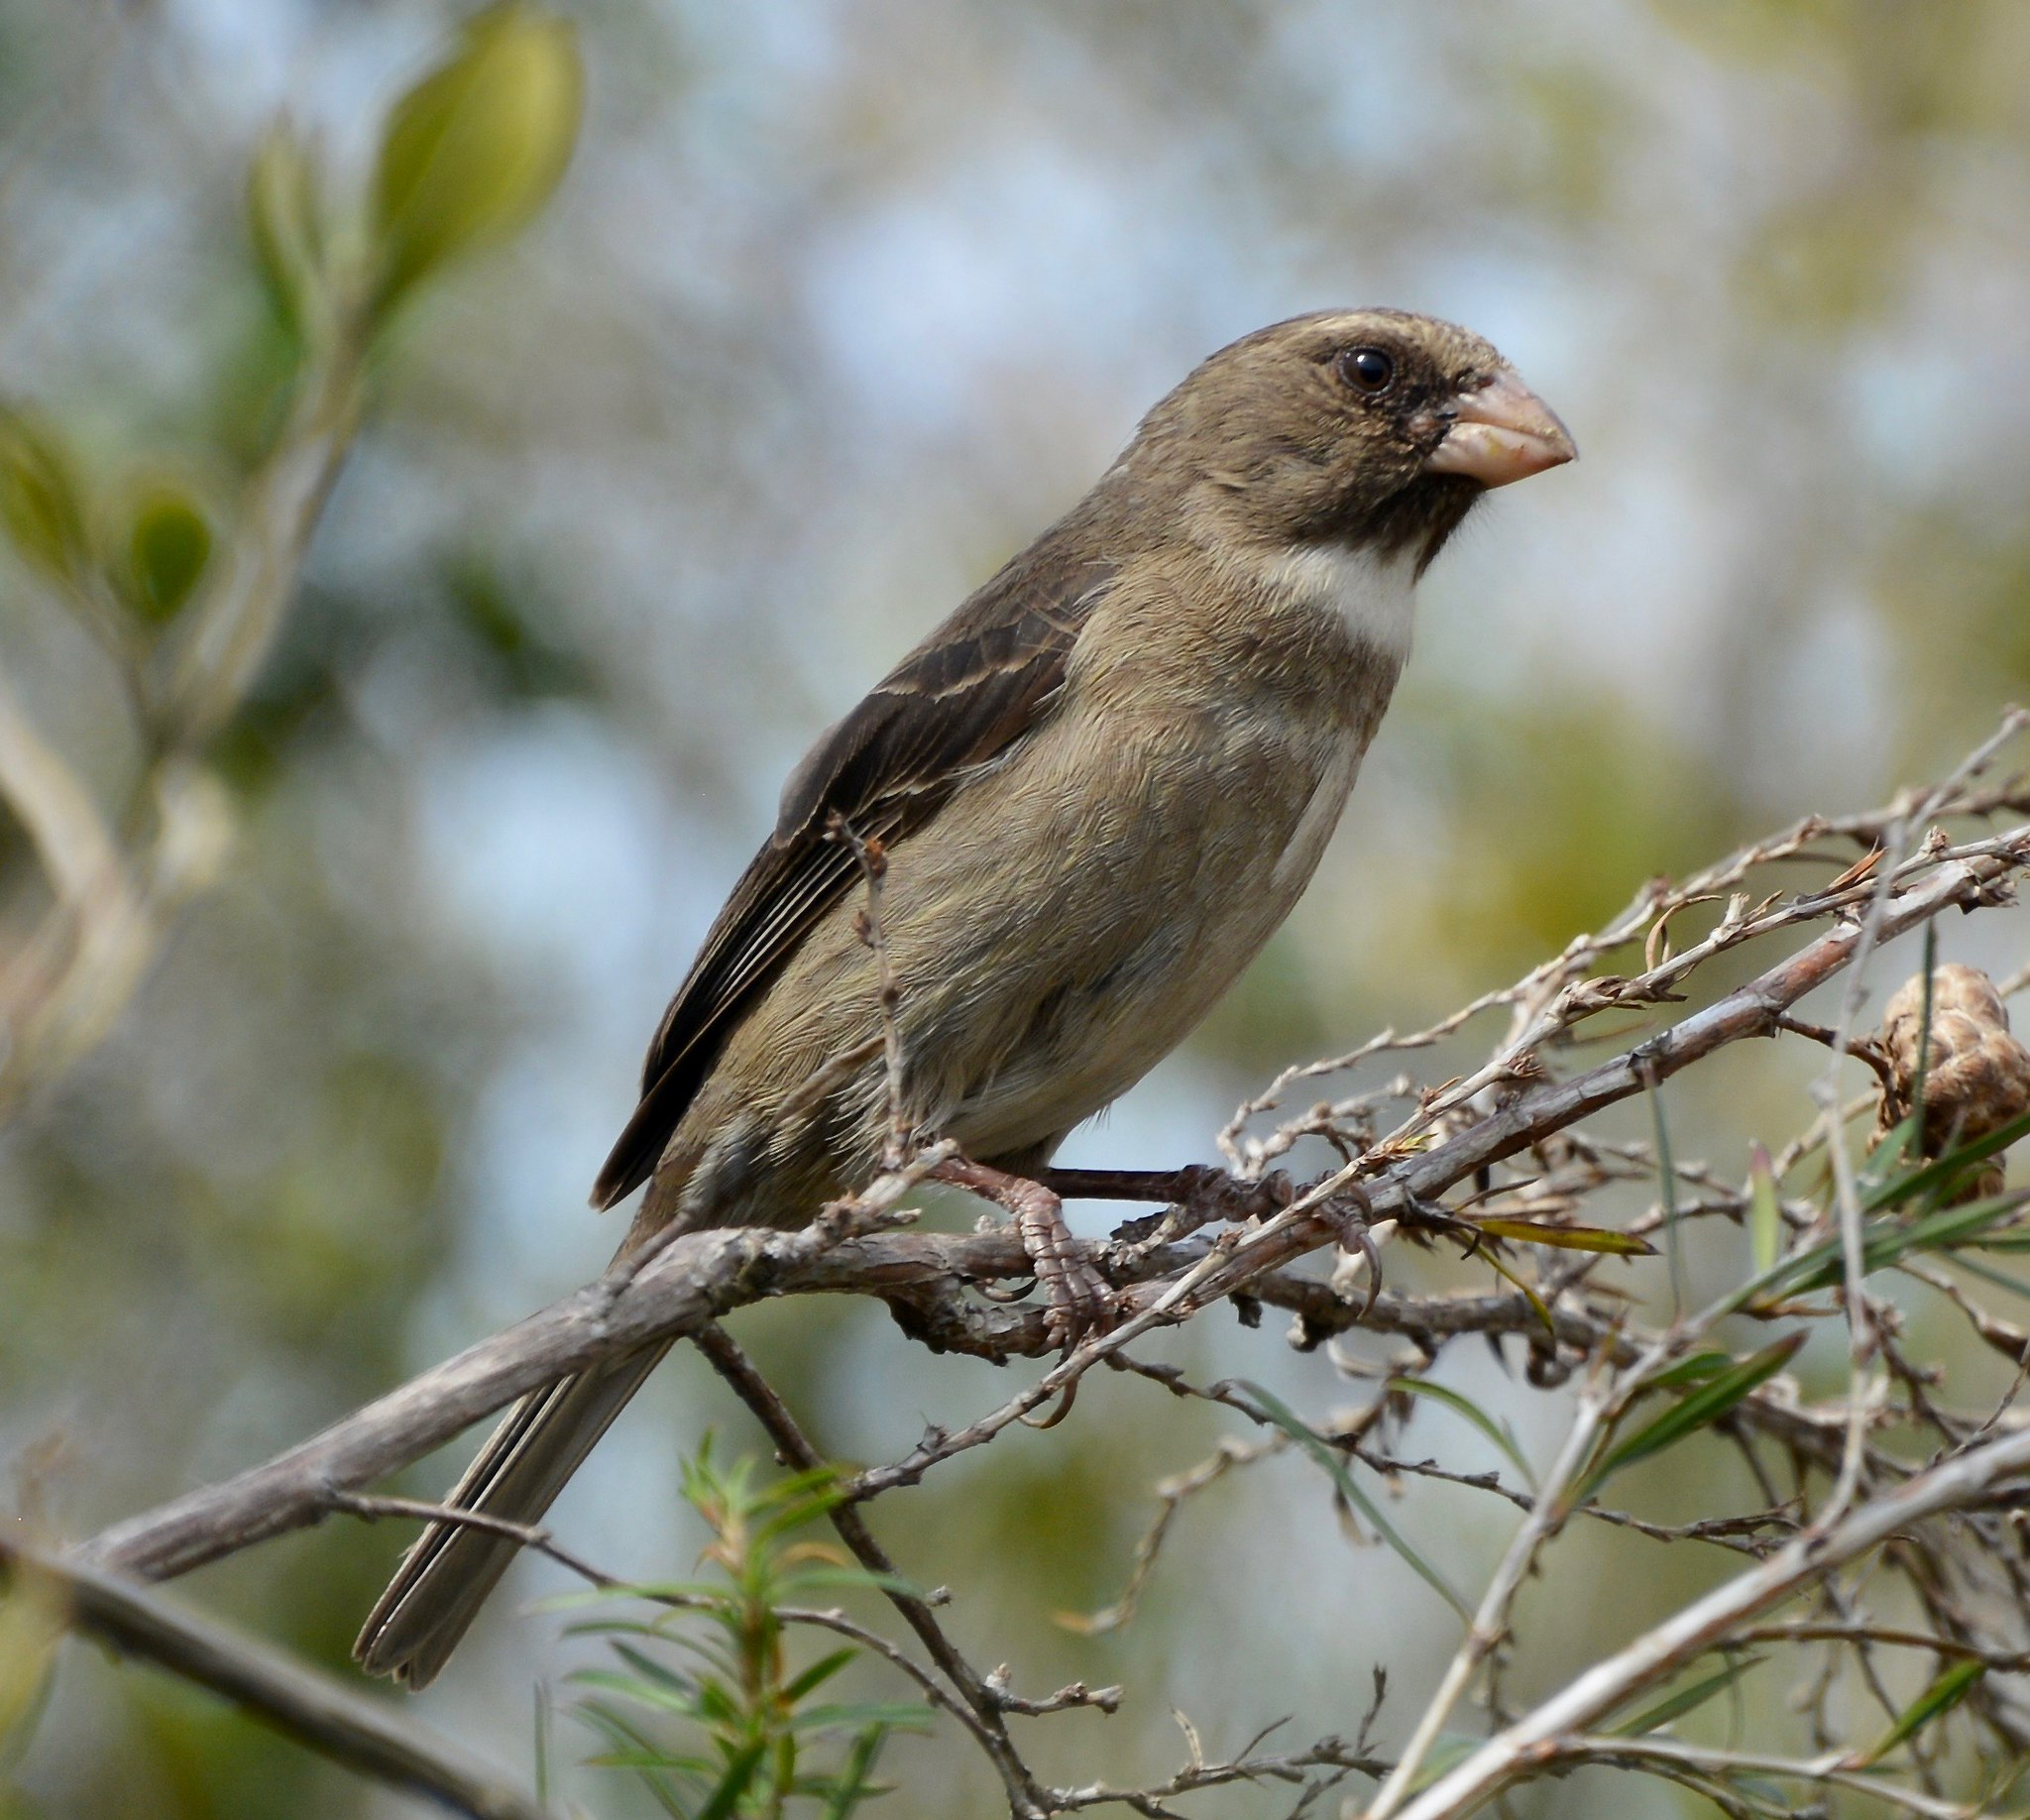 Protea canary